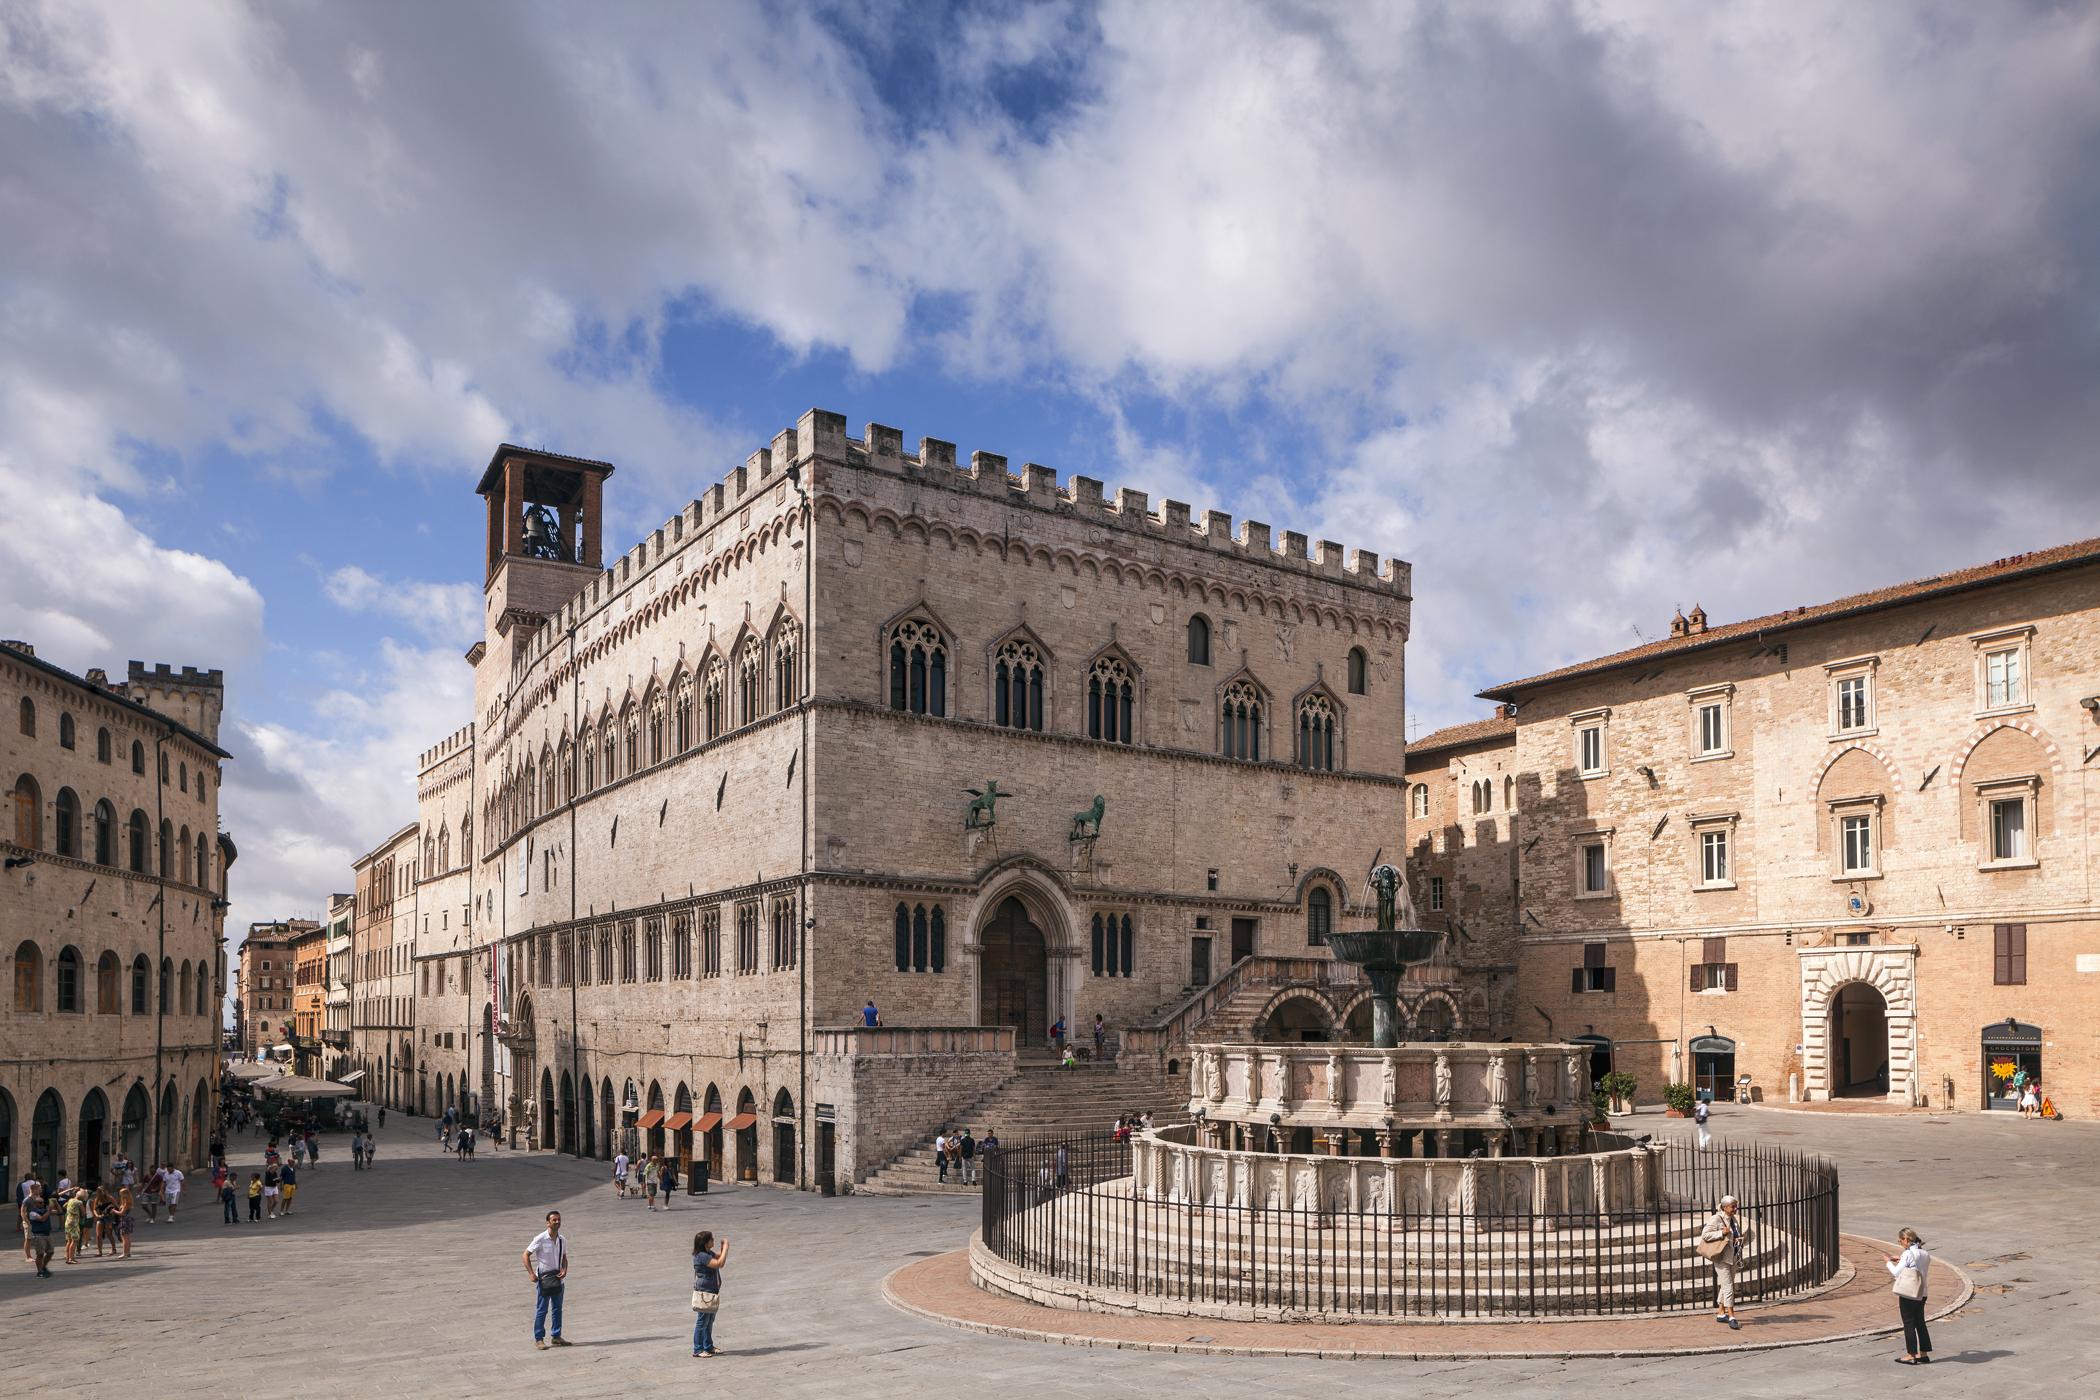 The Palazzo dei Priori in Perugia, Umbria